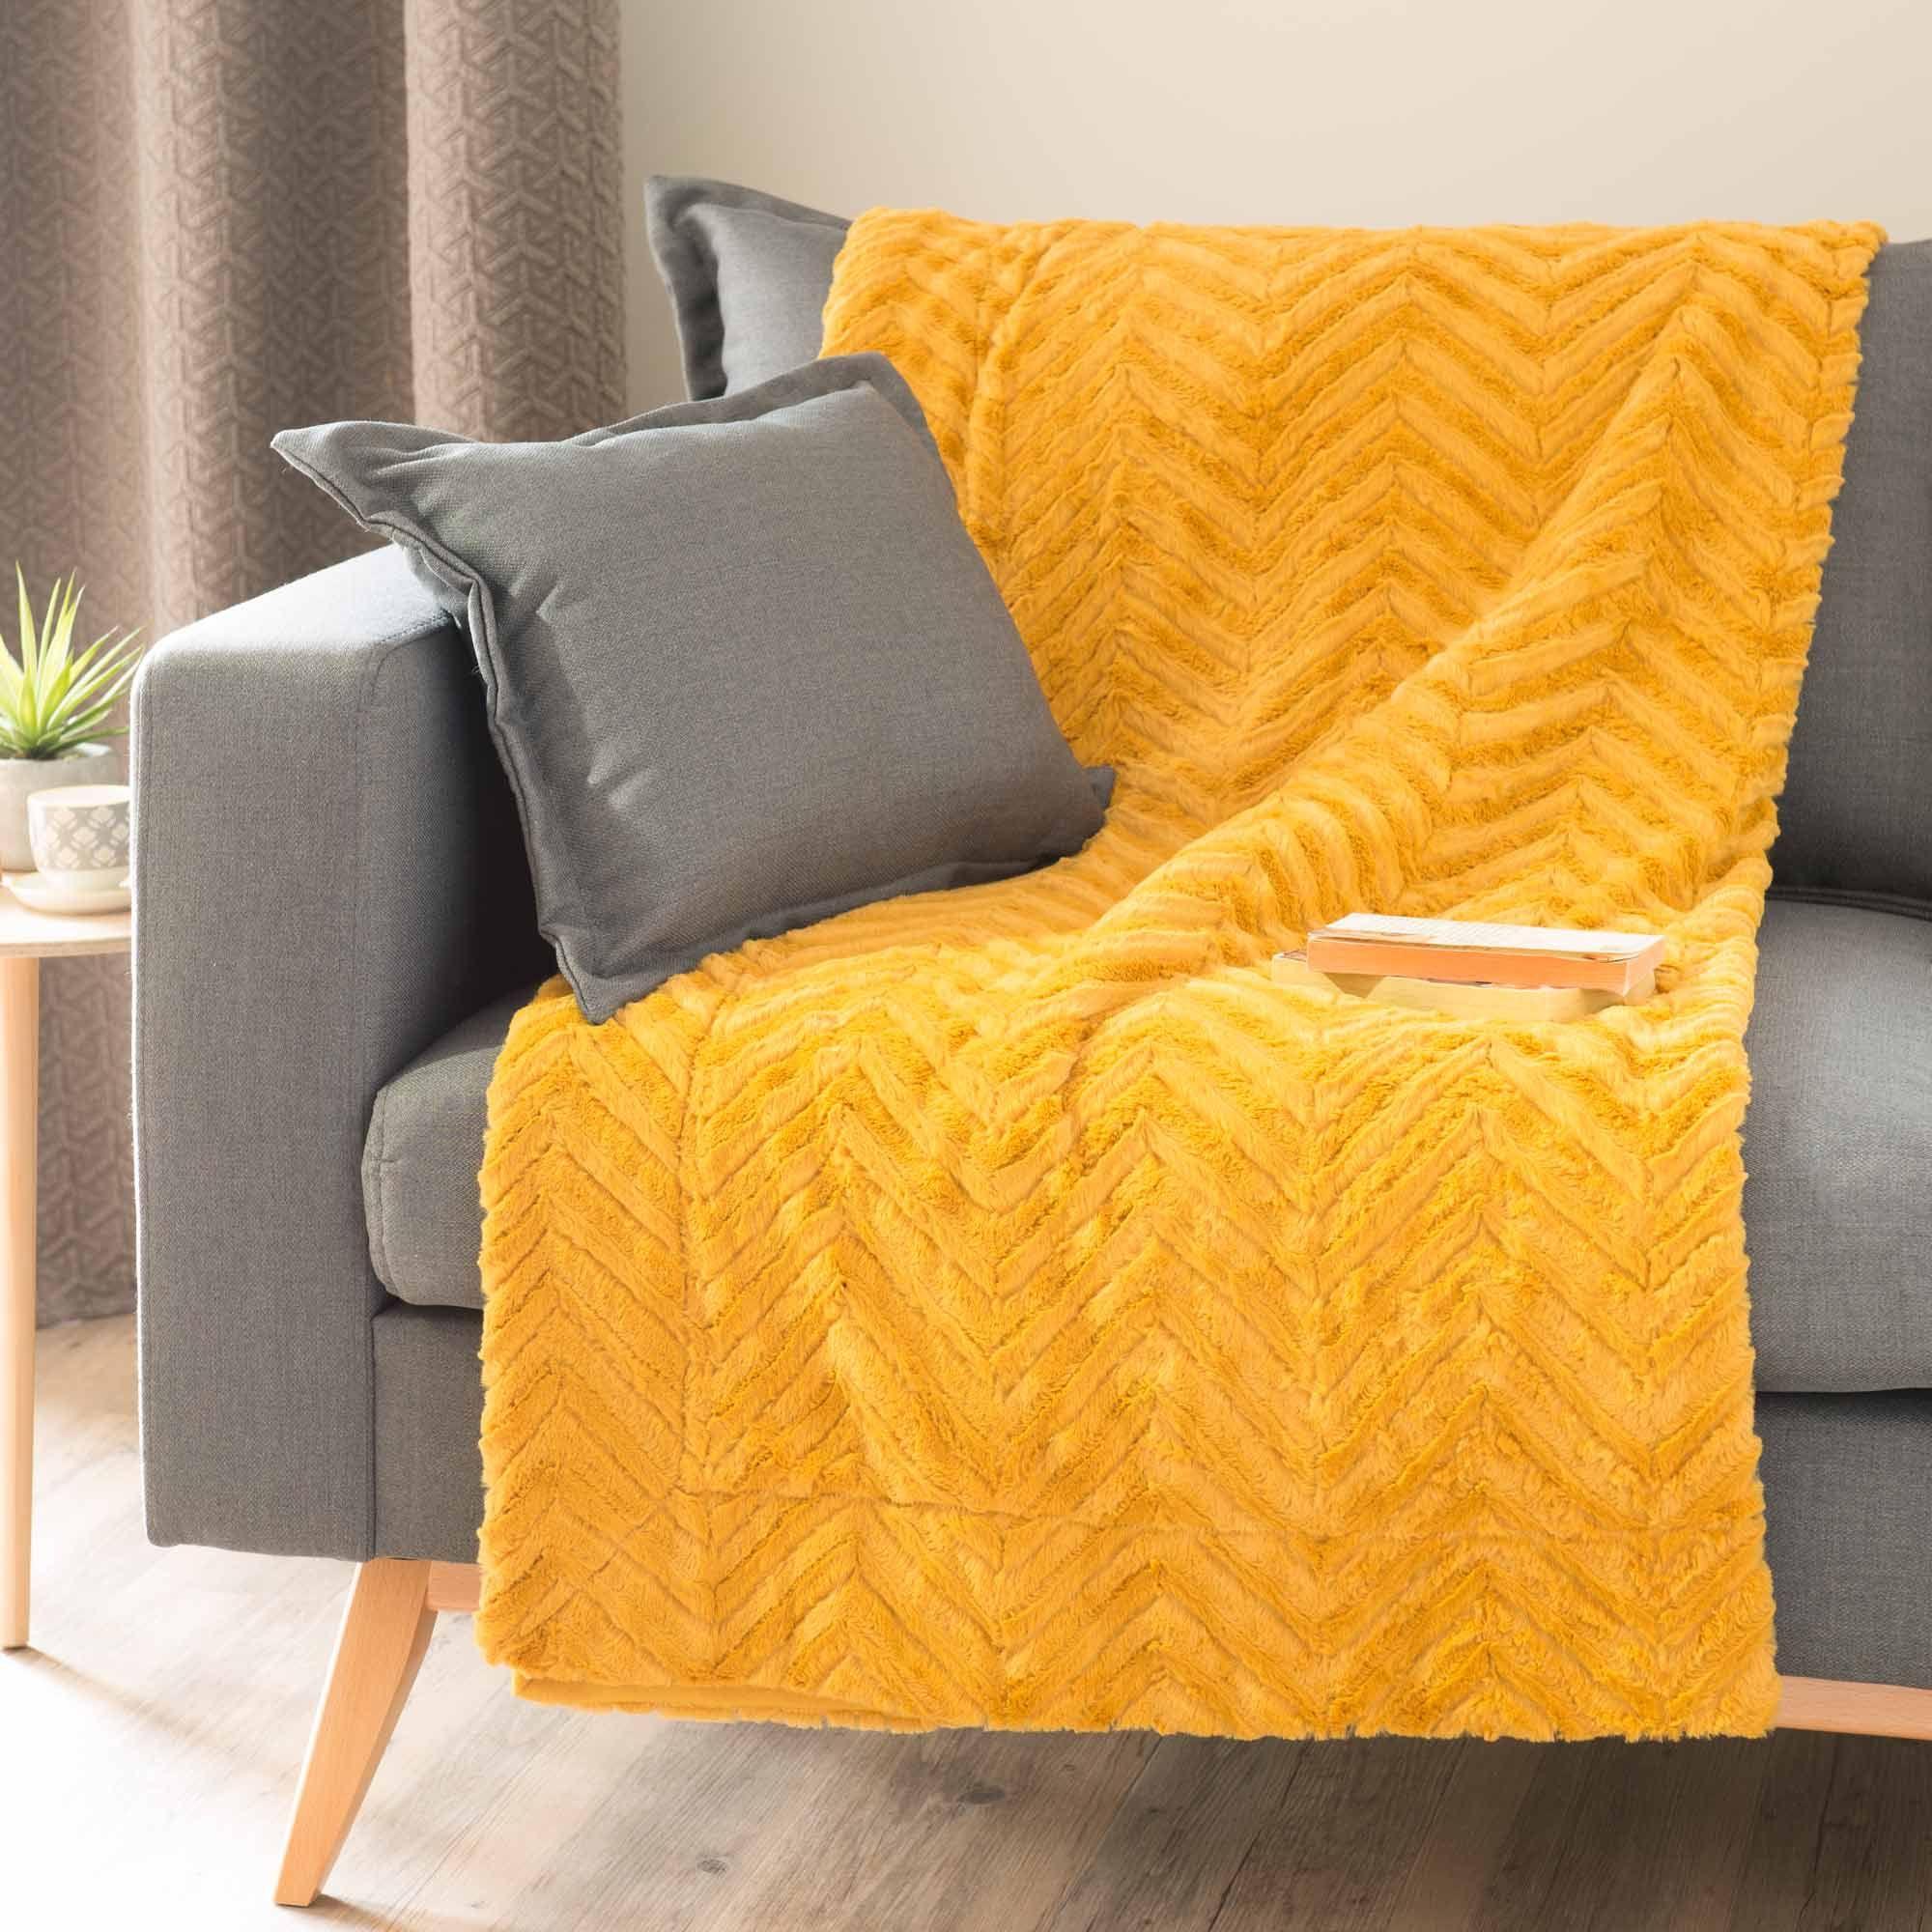 jet en fausse fourrure jaune moutarde 130 x 170 cm pearson my home deco jaune moutarde. Black Bedroom Furniture Sets. Home Design Ideas